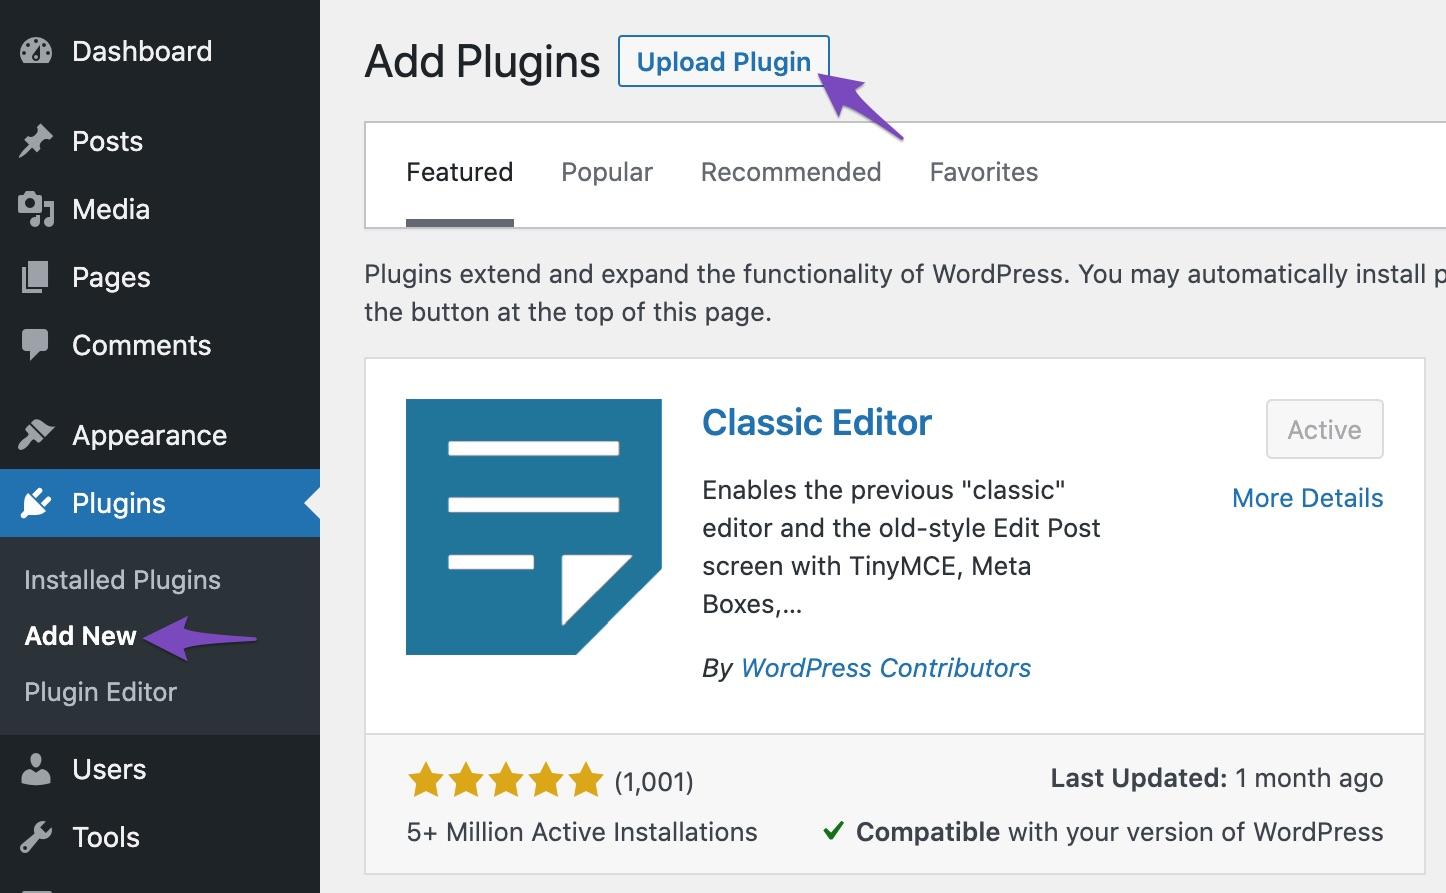 Upload plugin on Add New plugin